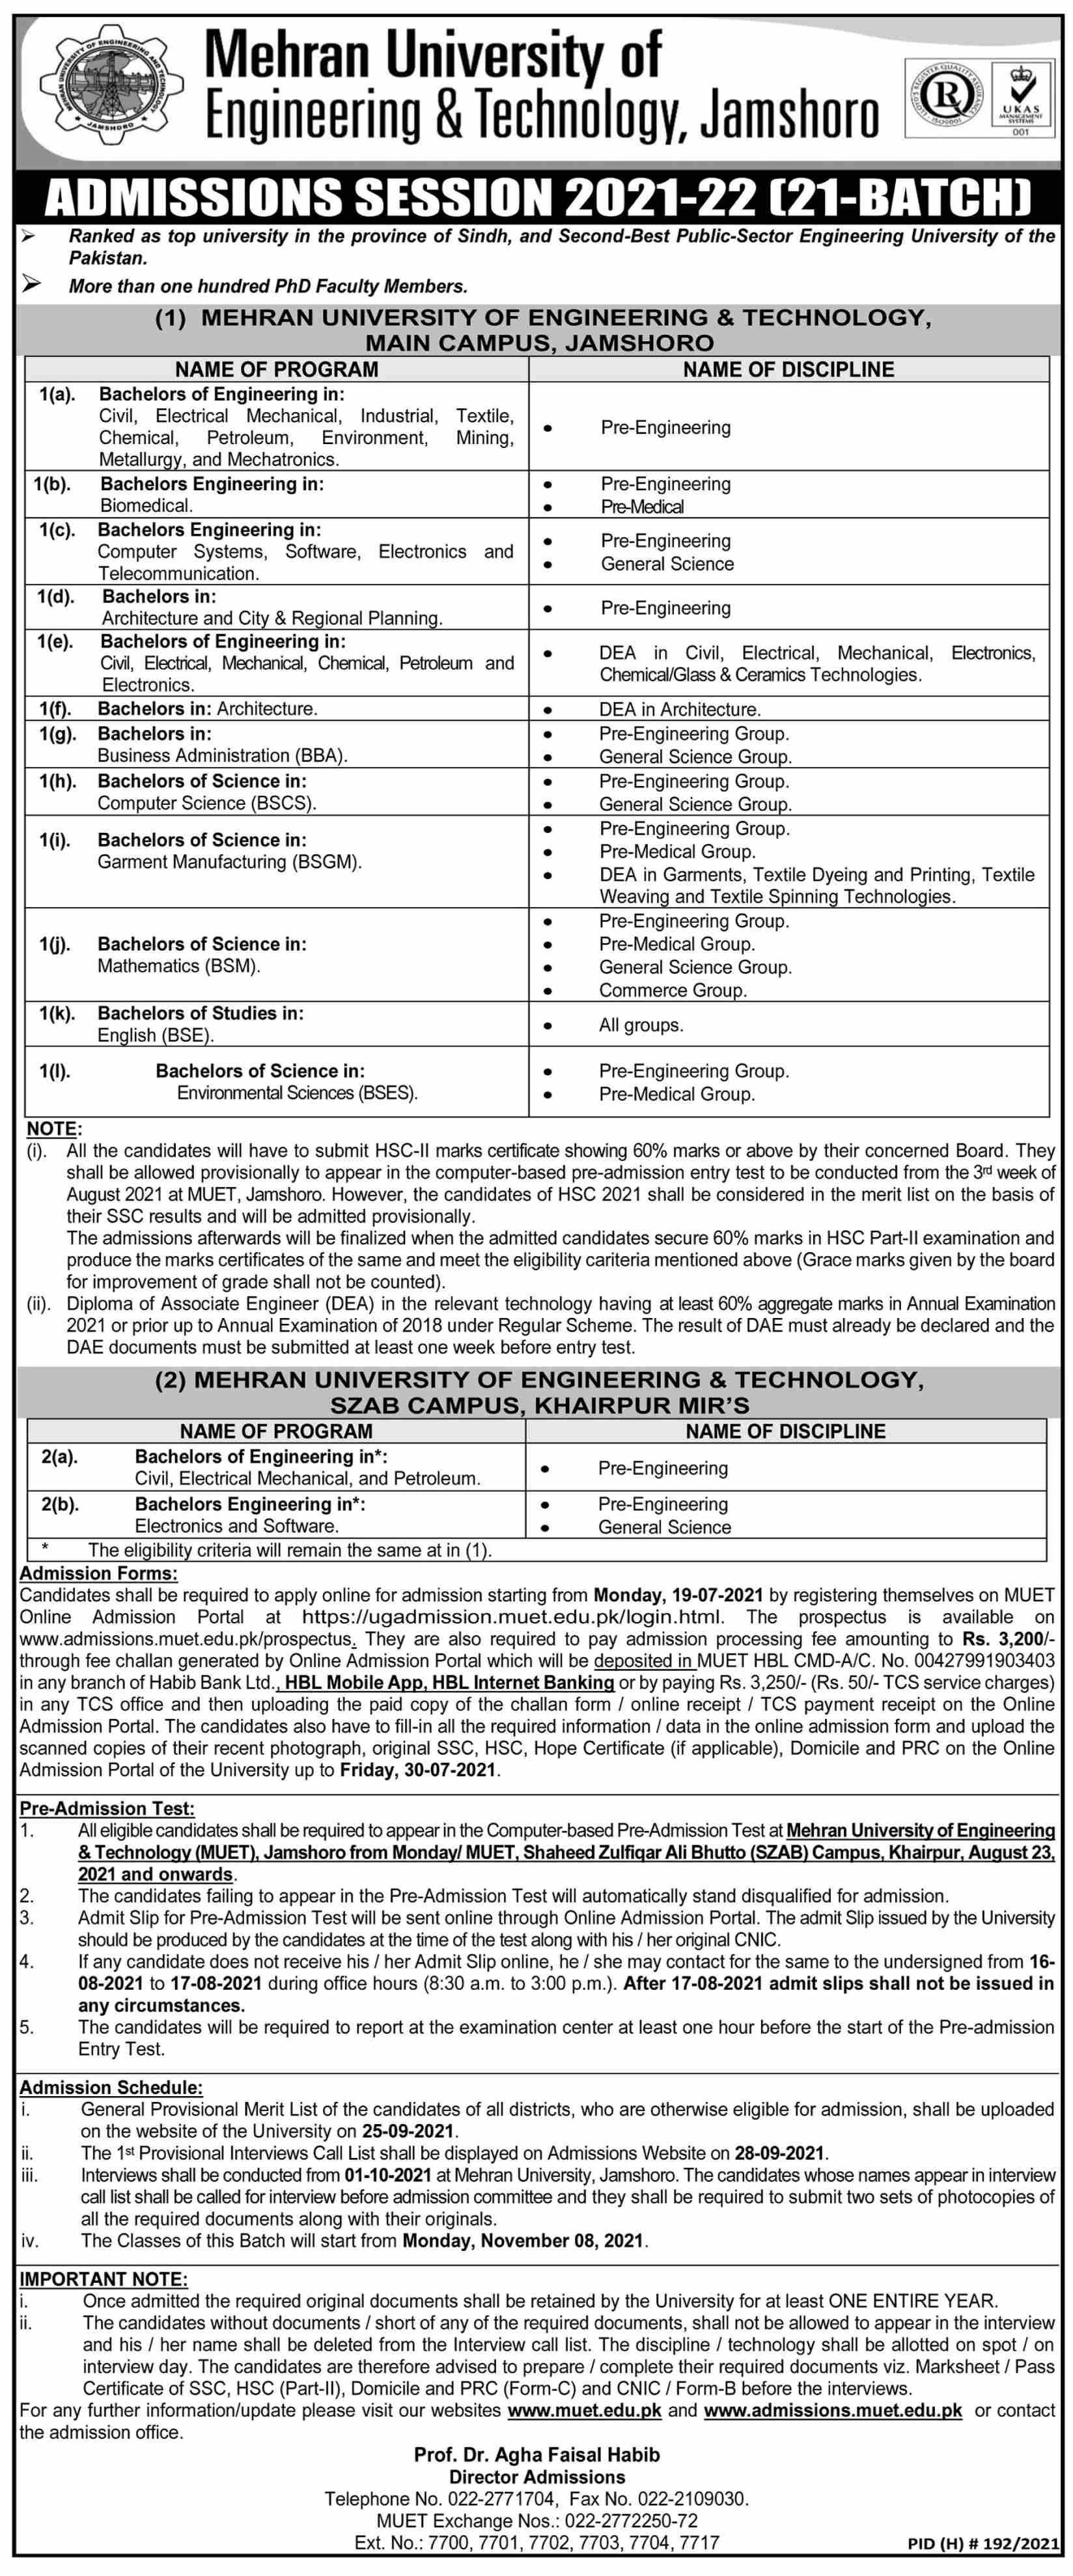 Mehran University Of Engineering & Technology Jamshoro Admissions